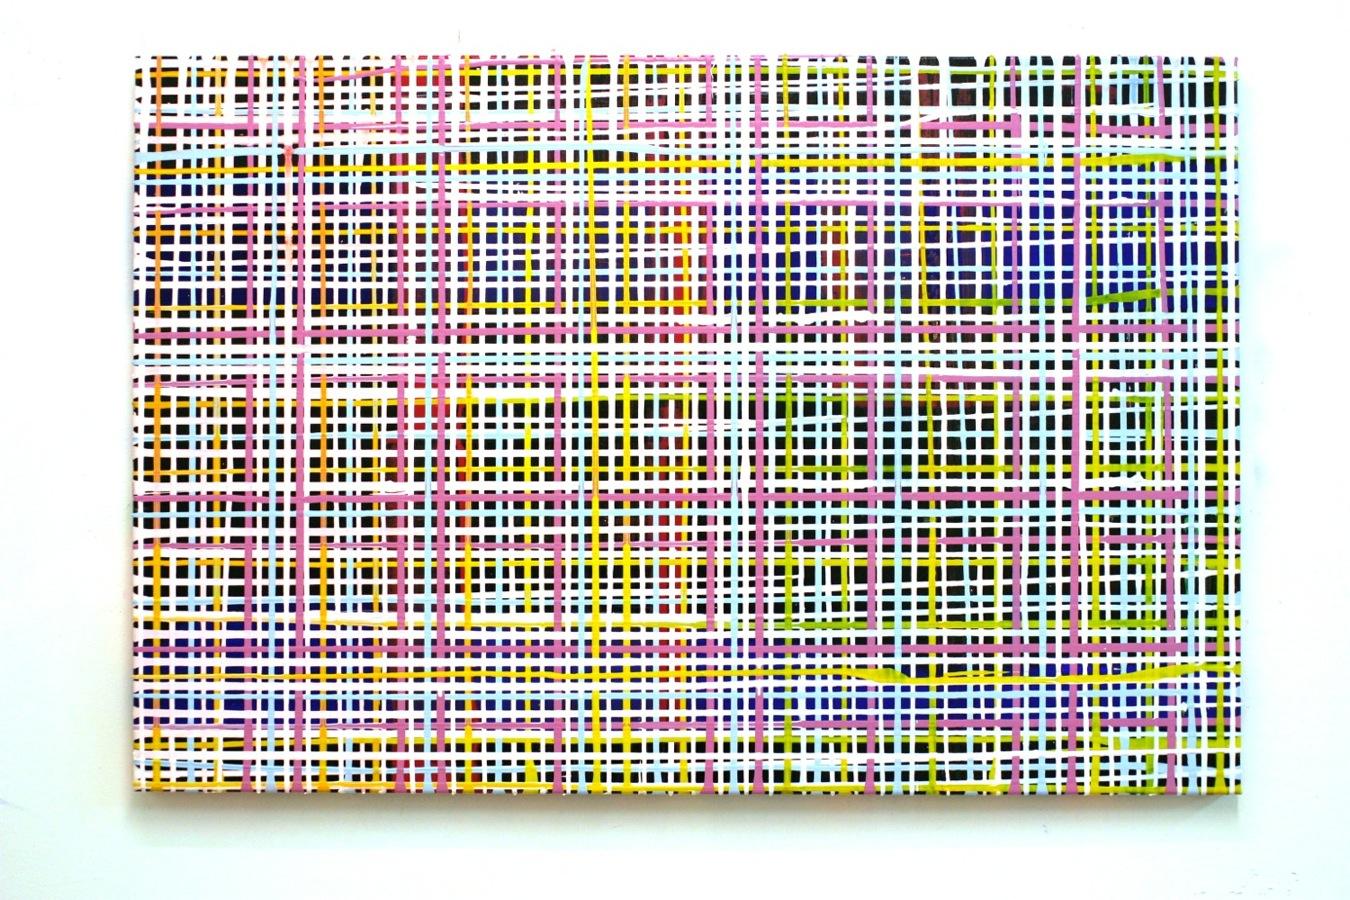 Gitter light, 140 x 80 cm, Acryl auf Leinwand